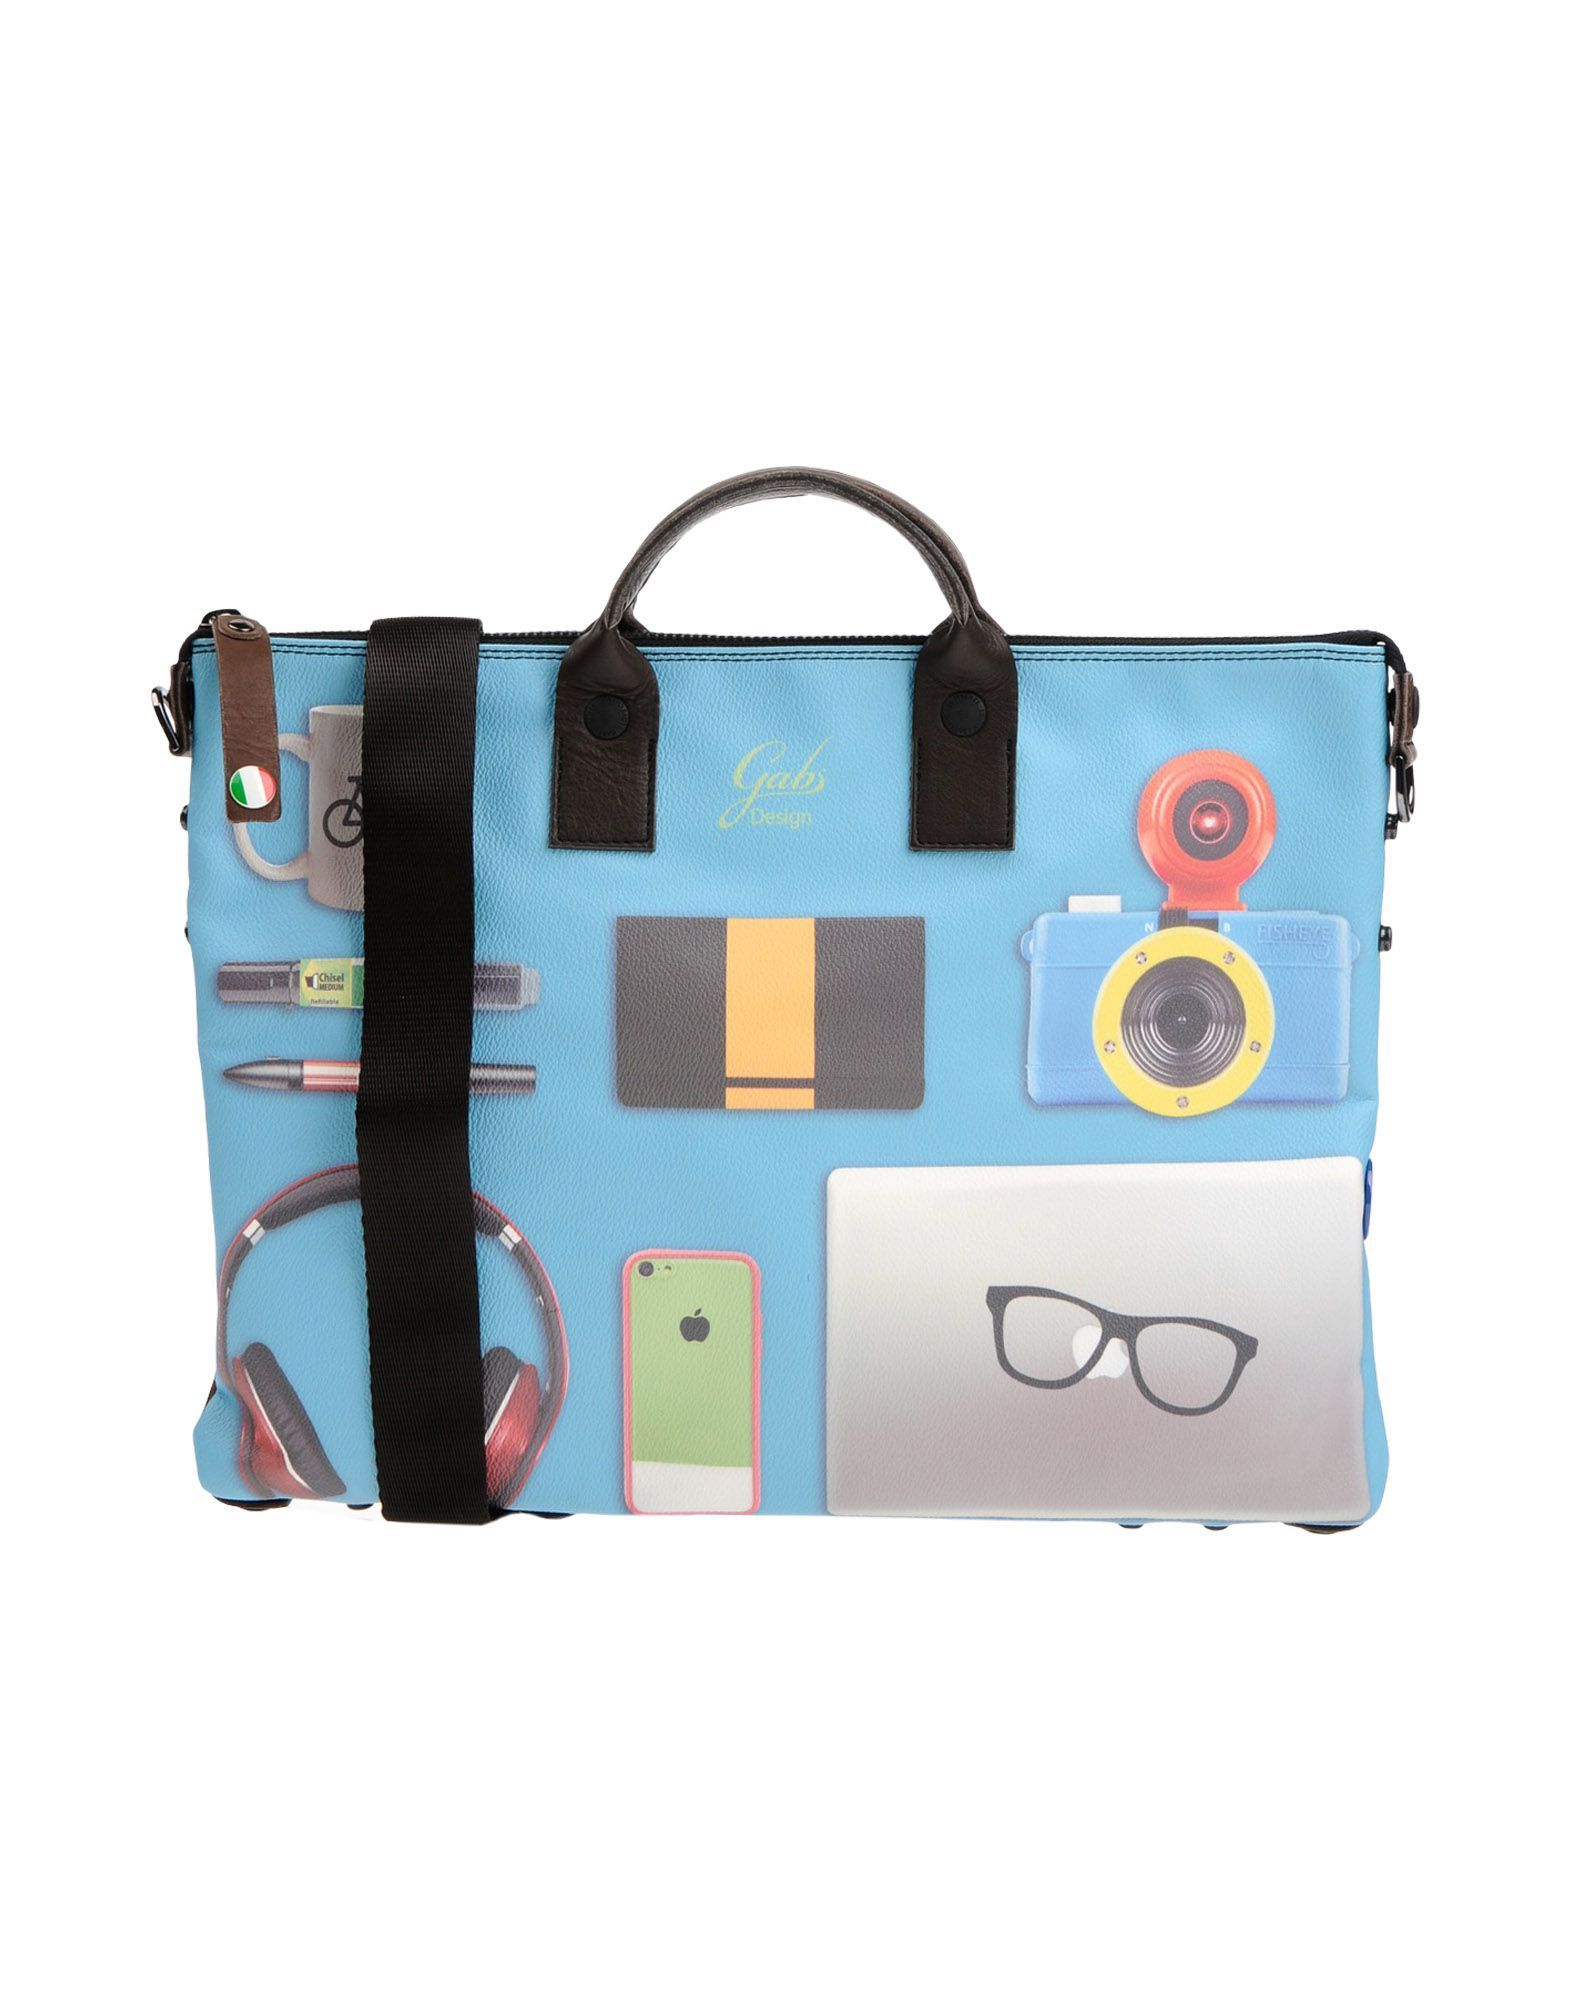 GABS .  gabs  bags  shoulder bags  hand bags  leather    7f9cd140e04ea